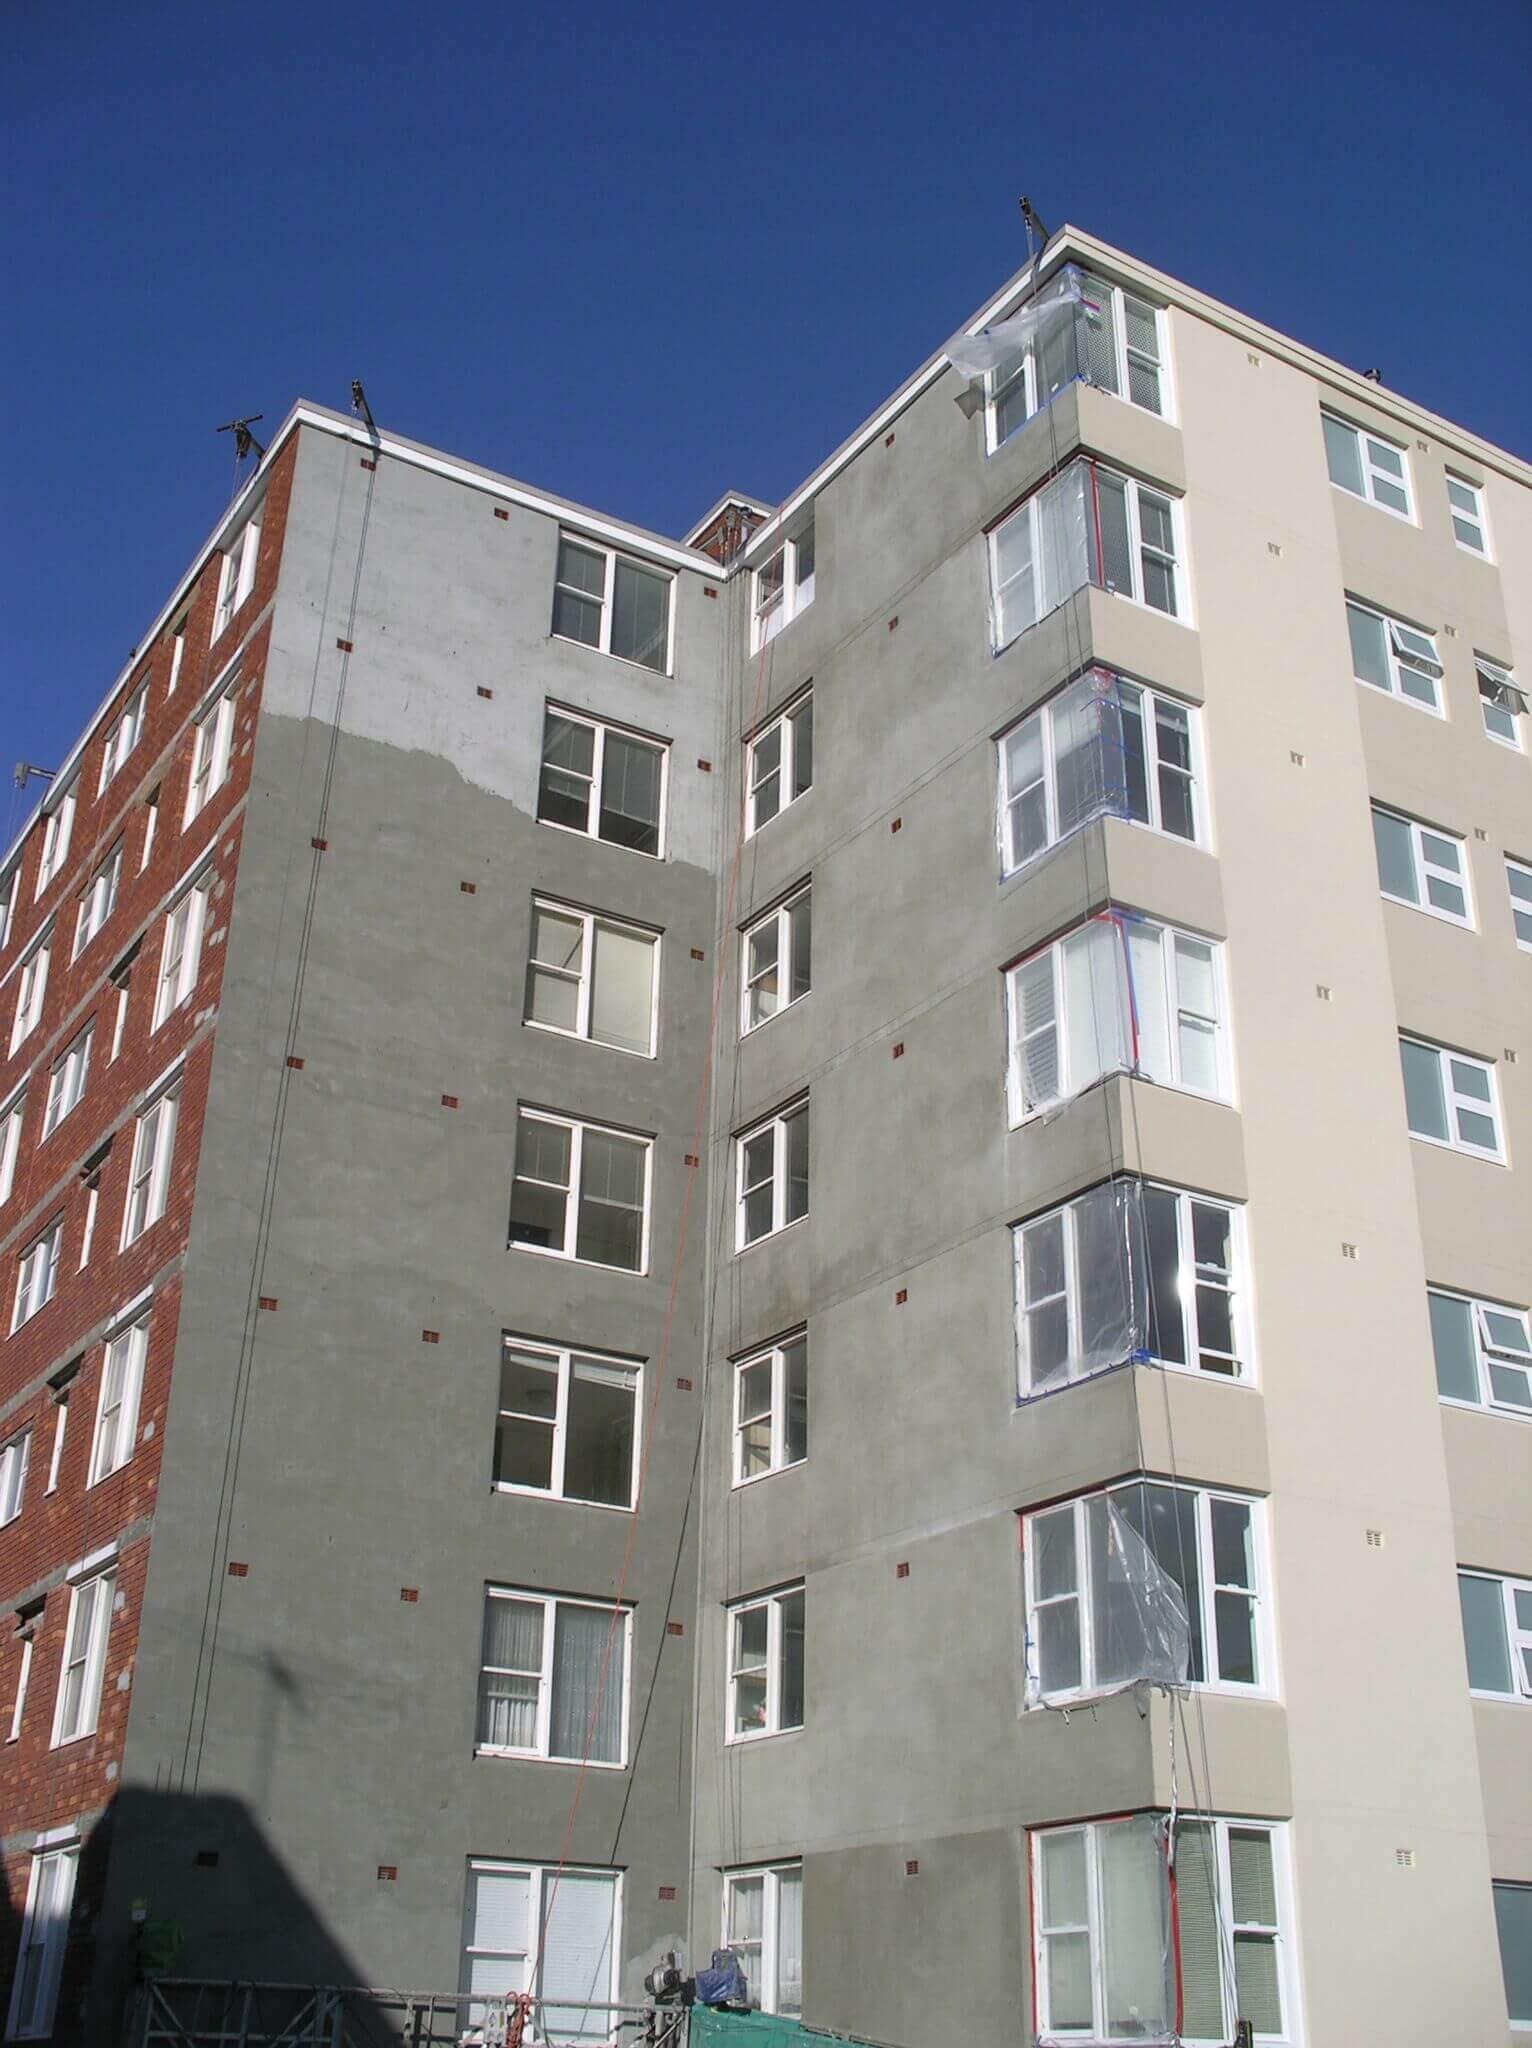 Façade Upgrades Works In Progress - Building Maintenance - Remedial Building Services